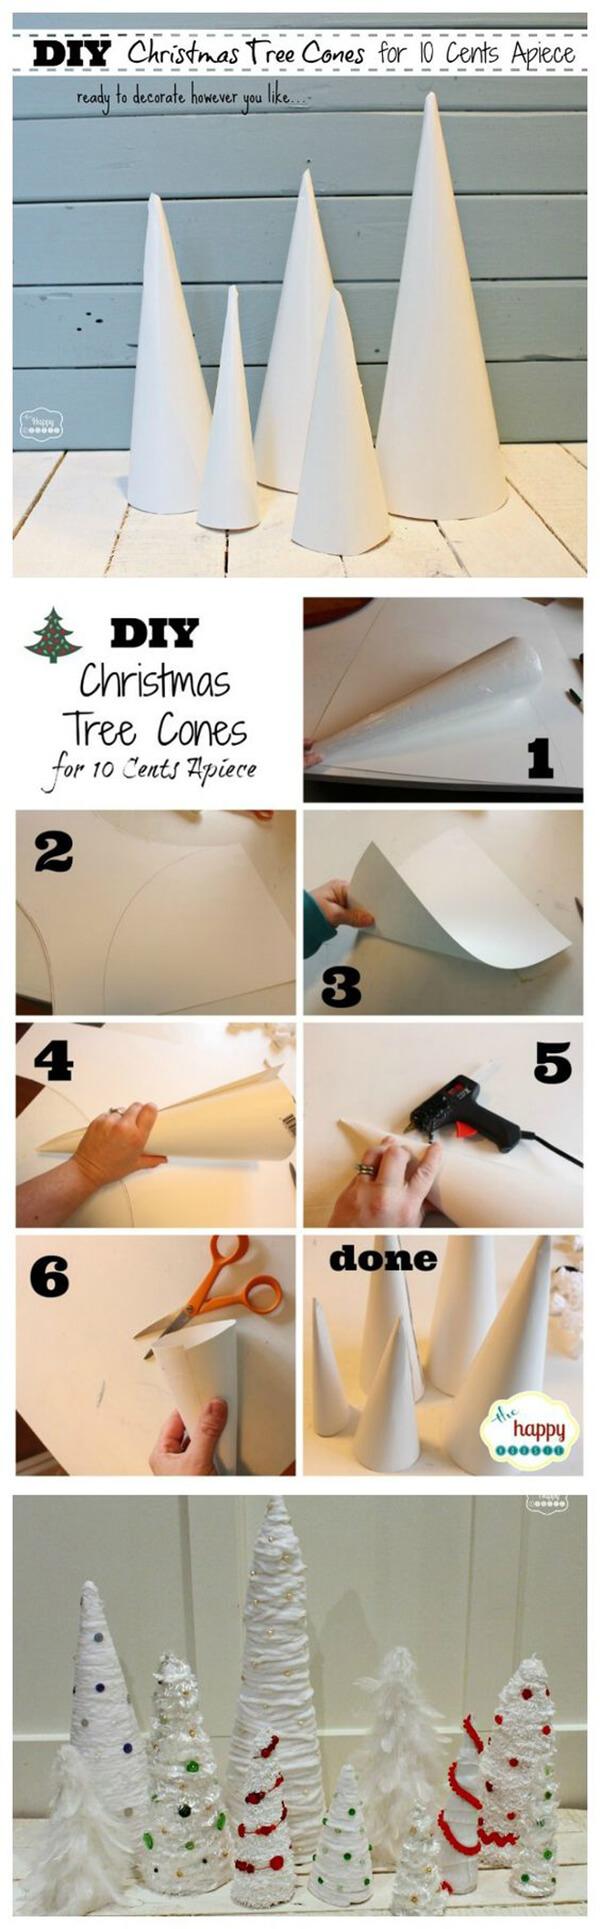 Easy 10-Cent DIY Christmas Trees